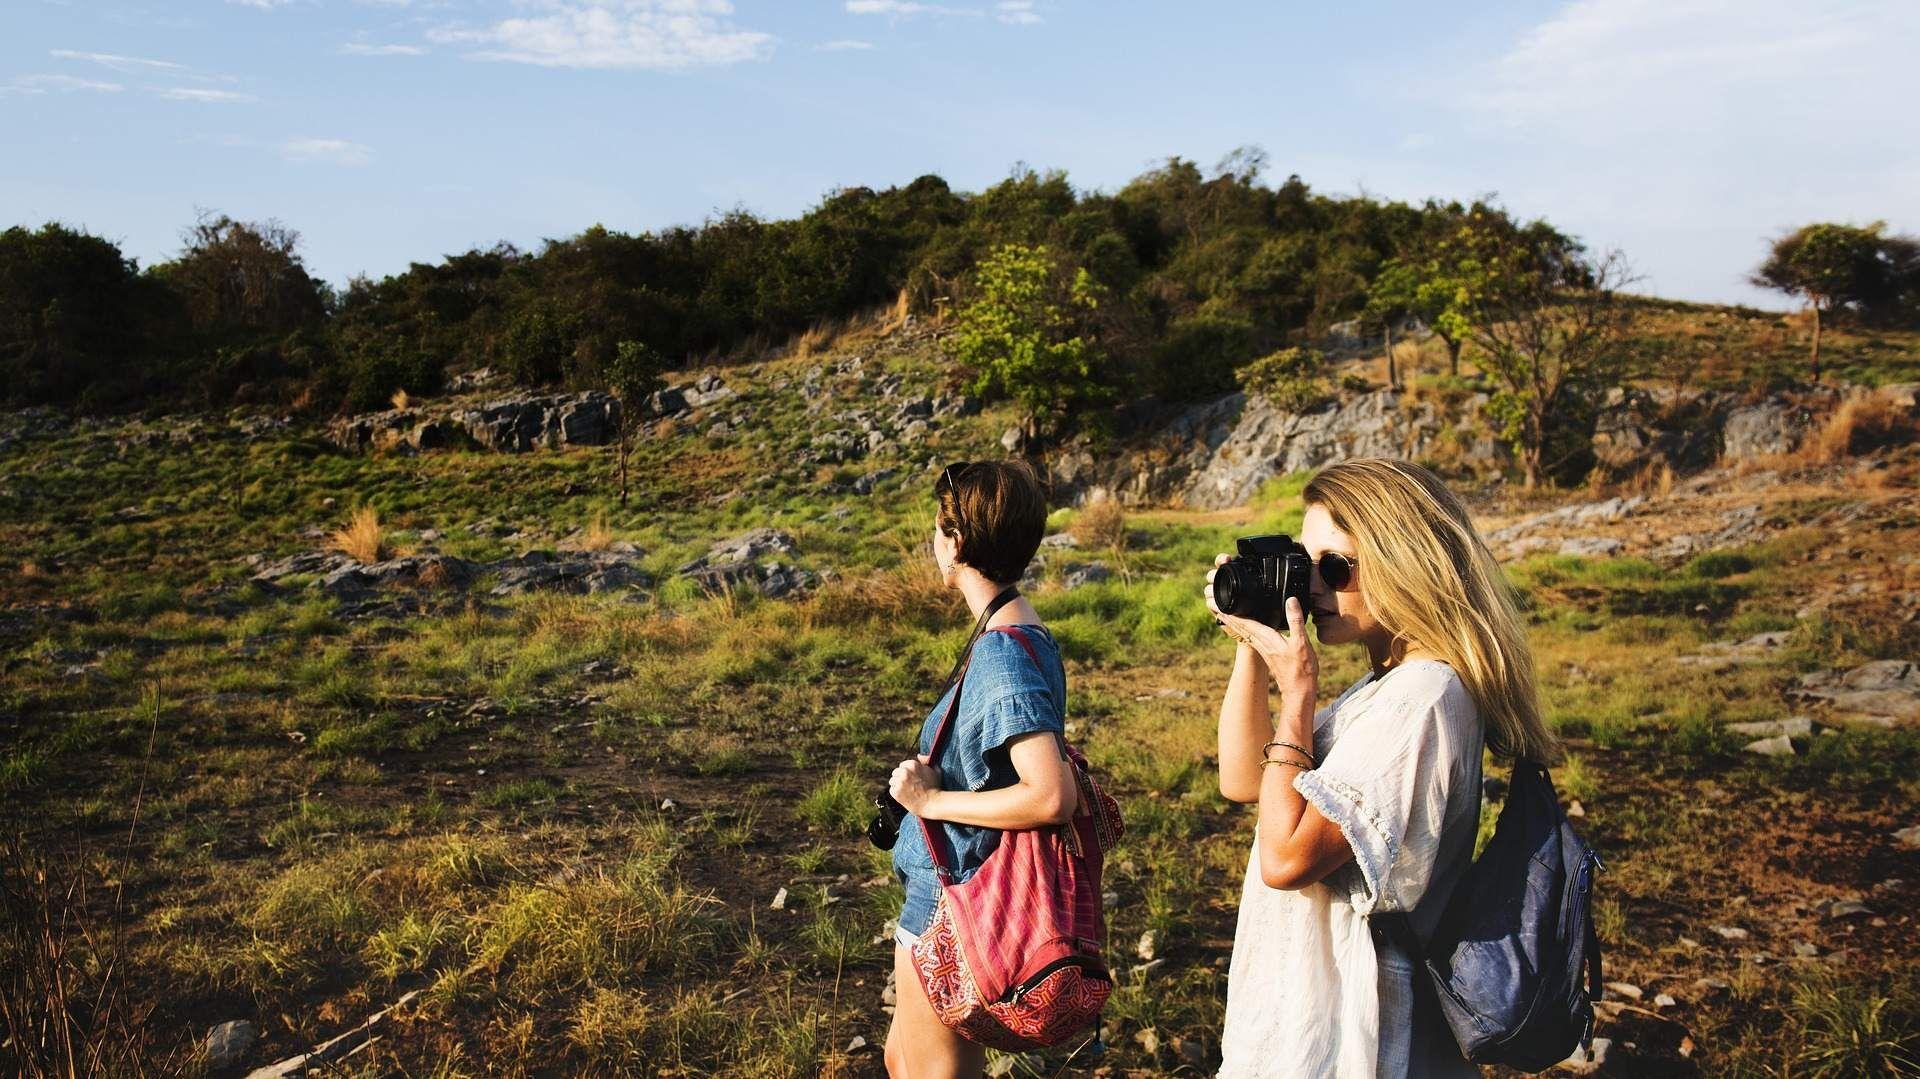 Catalunya: Fooding & Hiking!